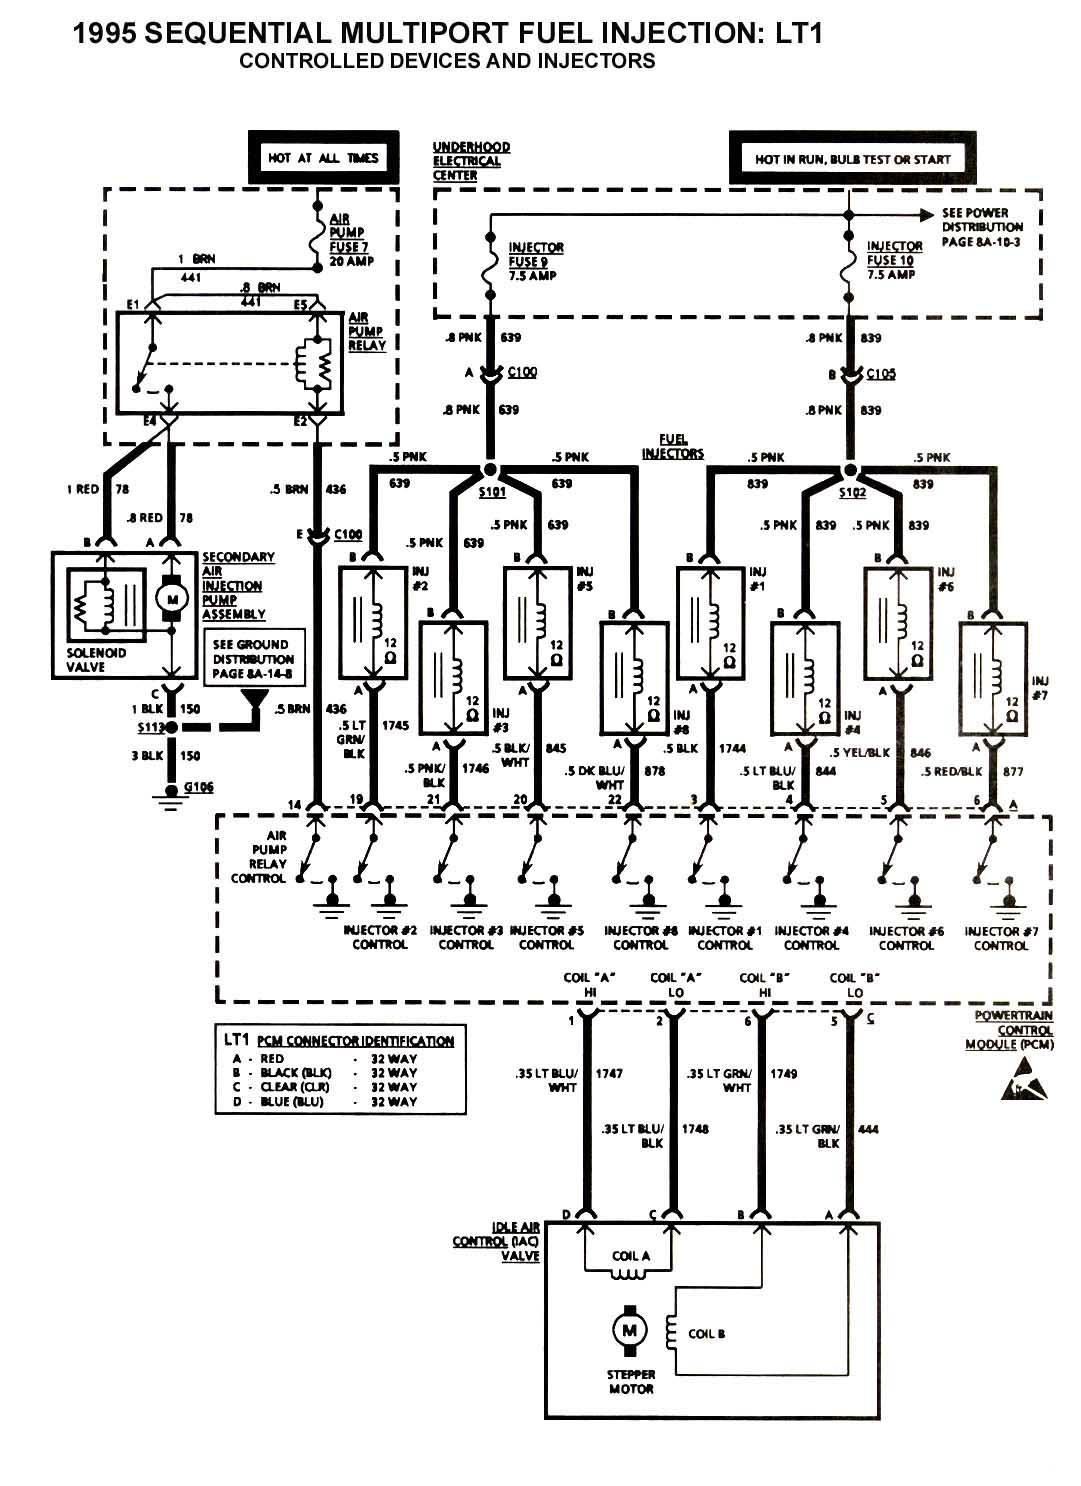 Gm Lt1 Alternator Wiring Wiring Diagram Session Session Lionsclubviterbo It